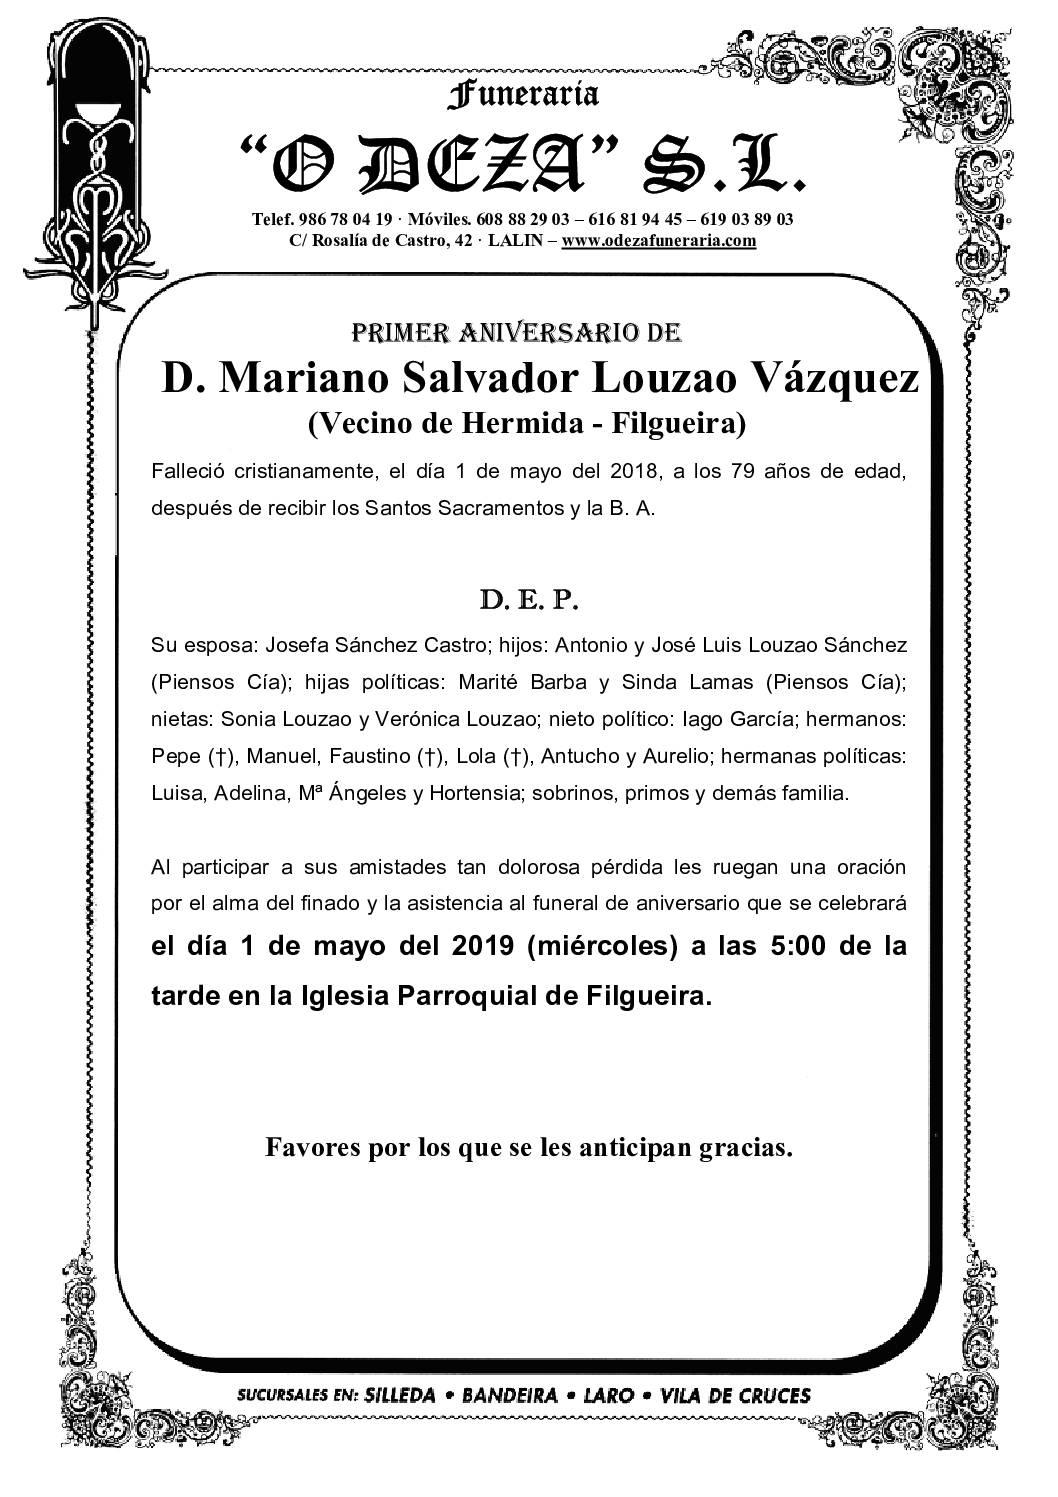 D. MARIANO SALVADOR LOUZAO VÁZQUEZ